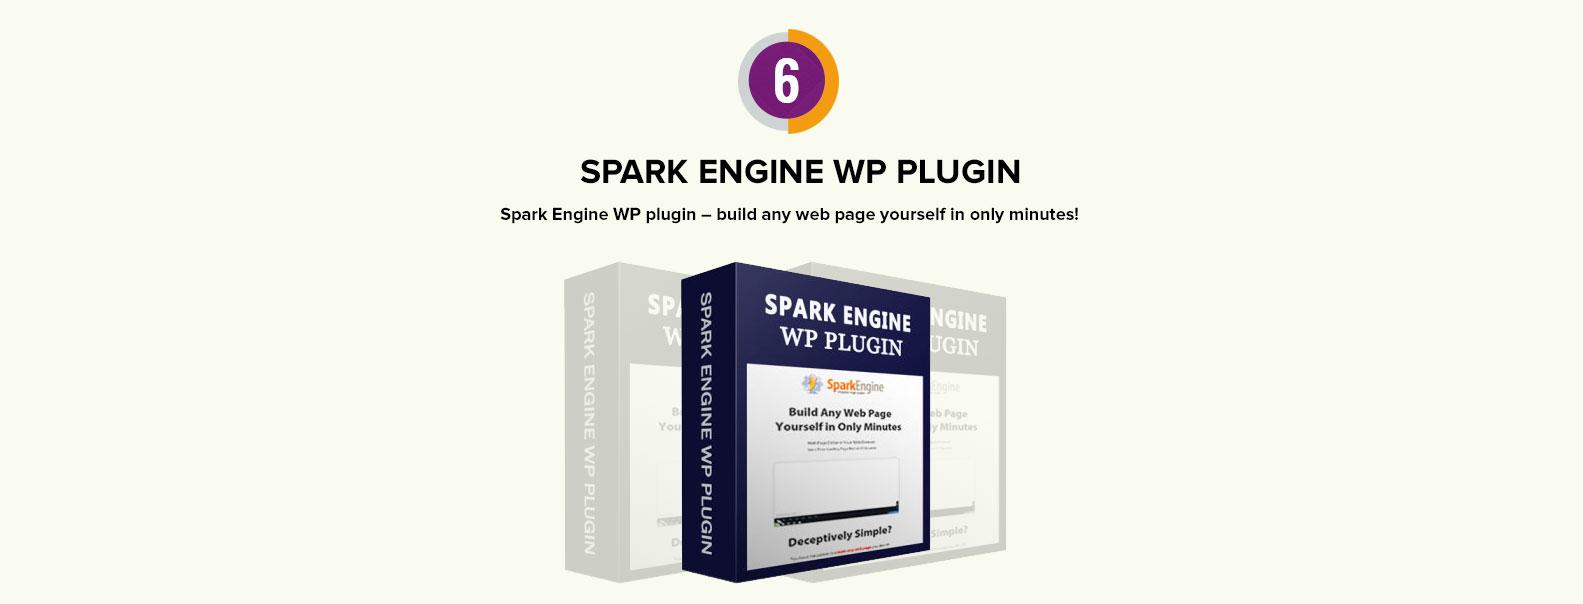 spark engine wp plugin